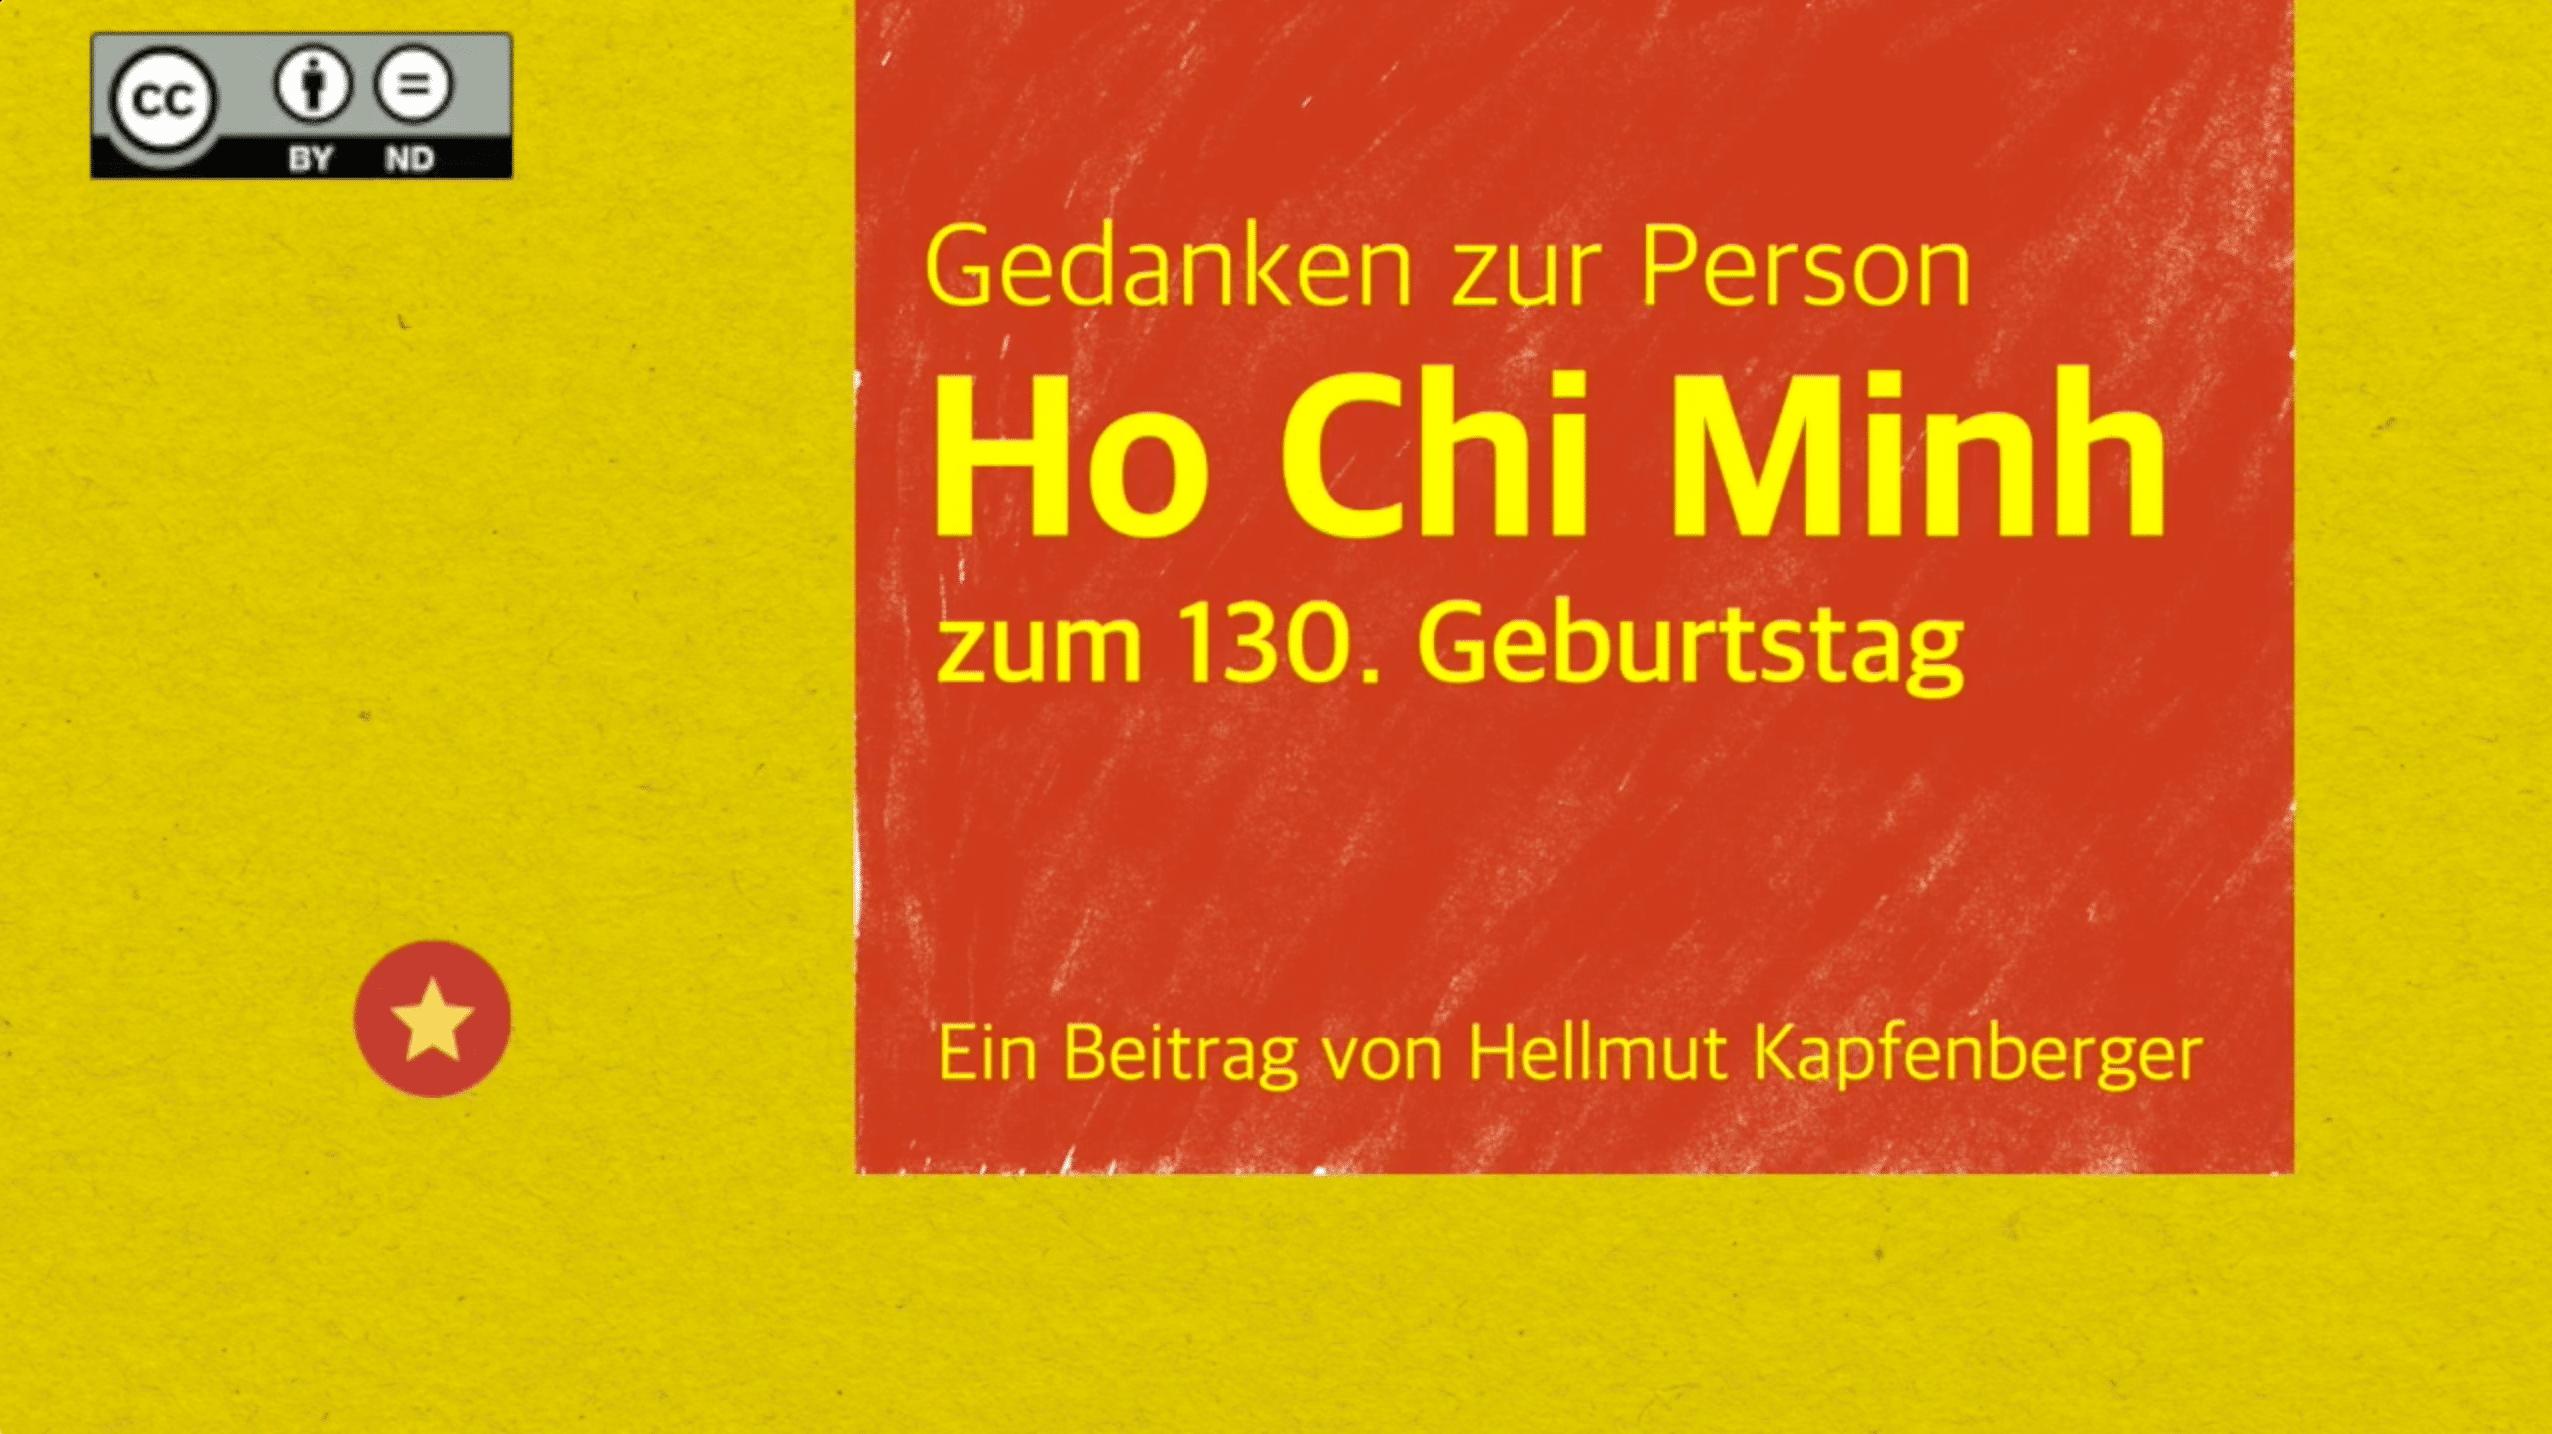 Hellmut Kapfenberger auf Youtube (link)